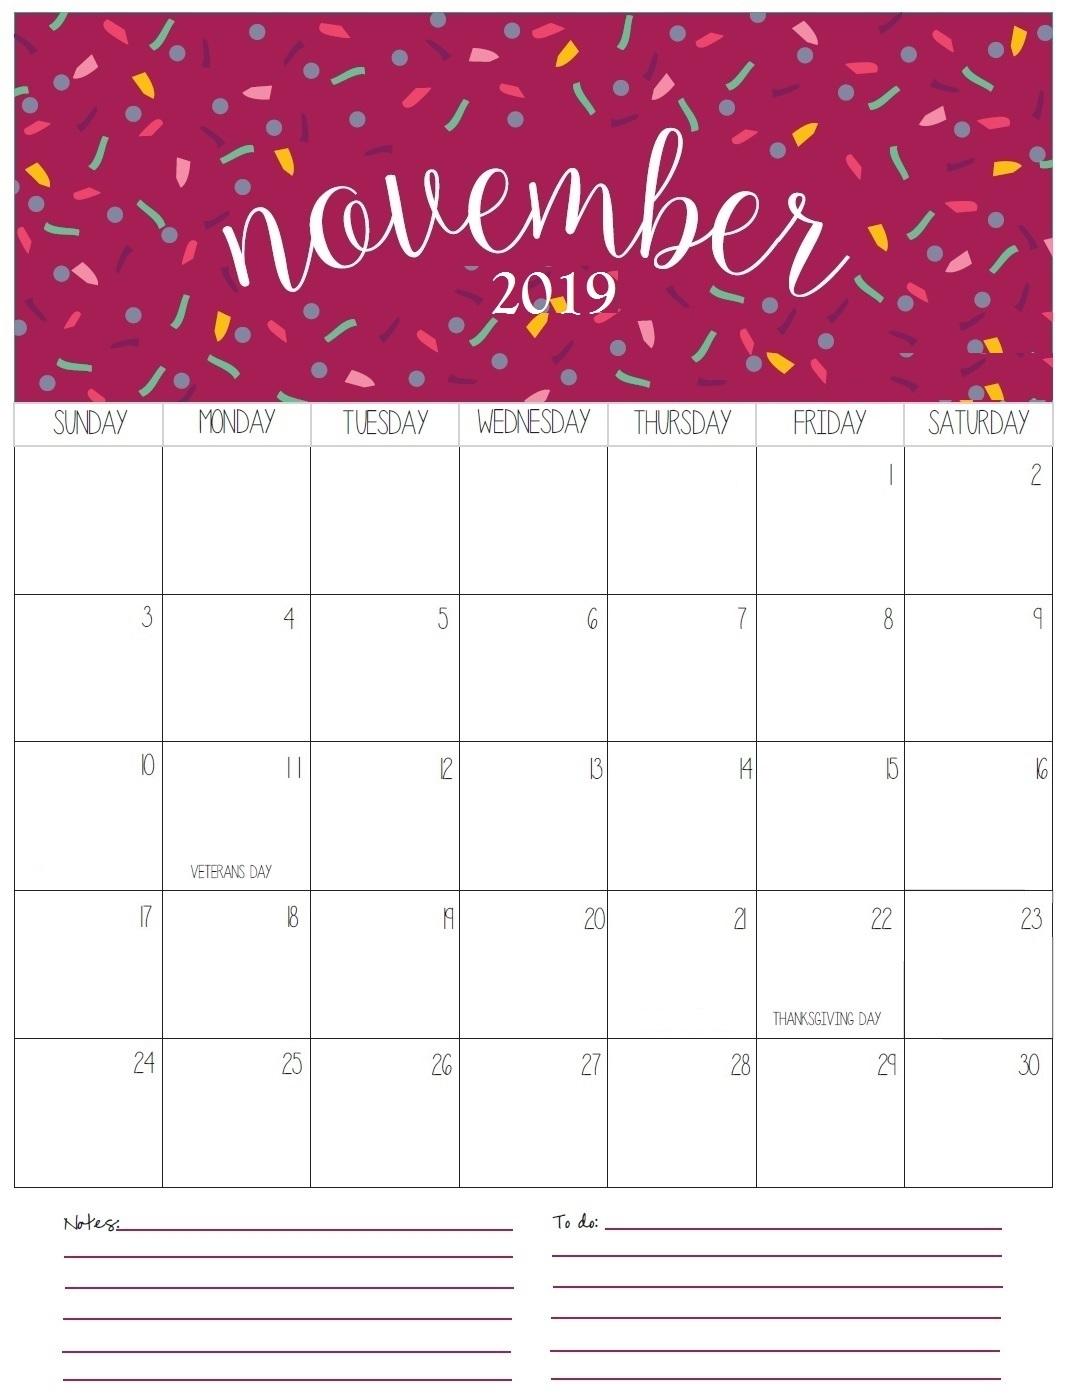 November 2019 Calendar To Print Pdf File Download